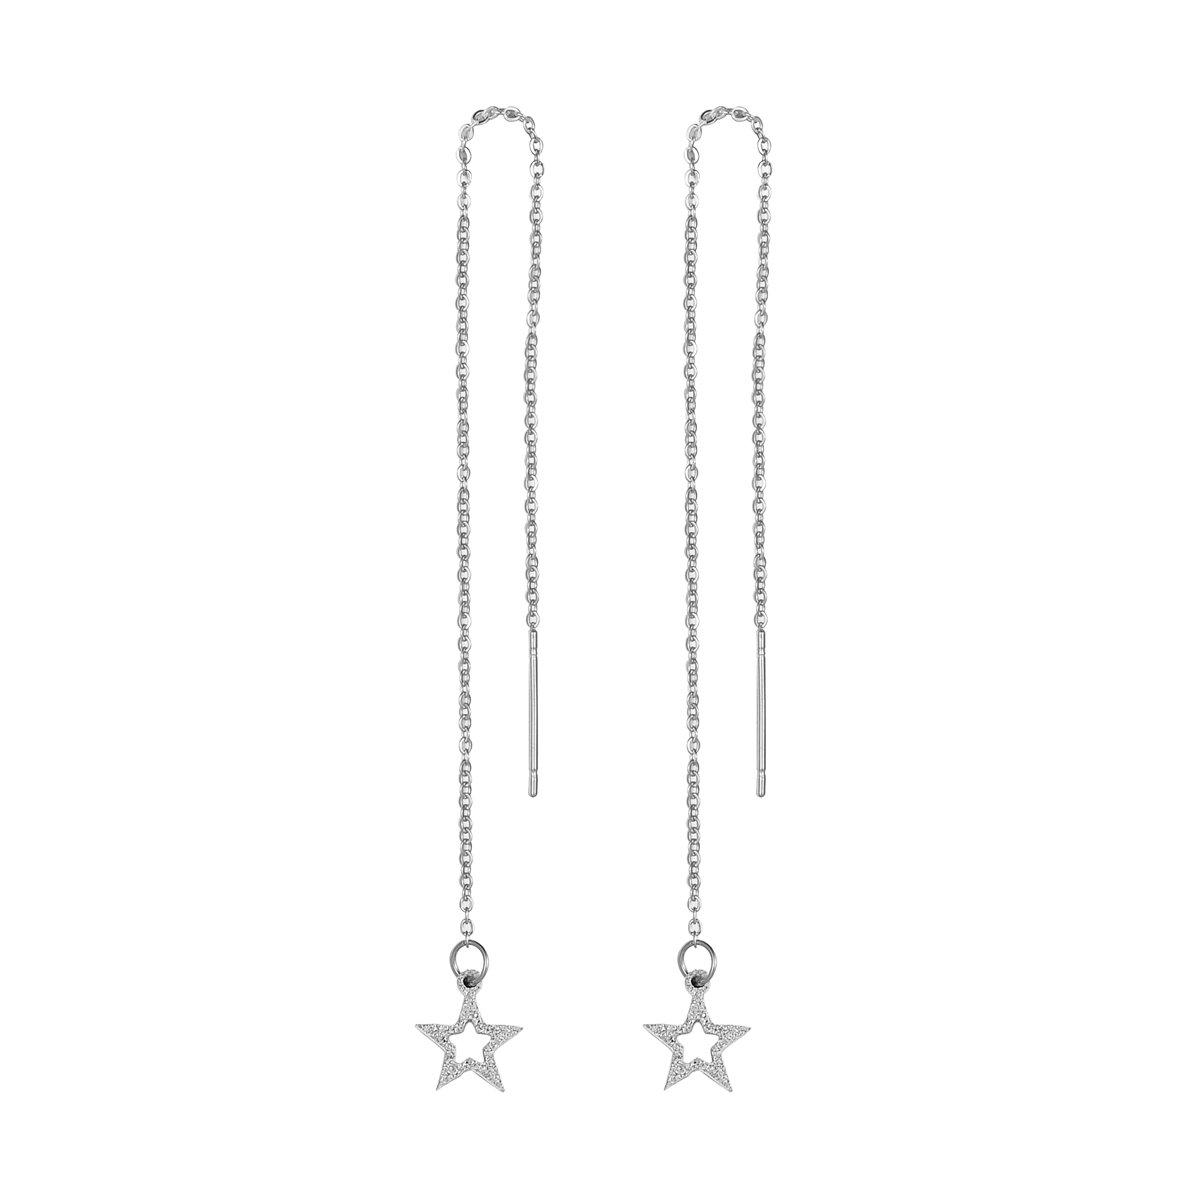 HooAMI Stainless Steel Hollow Star Threader Drop Earrings For Women Girls